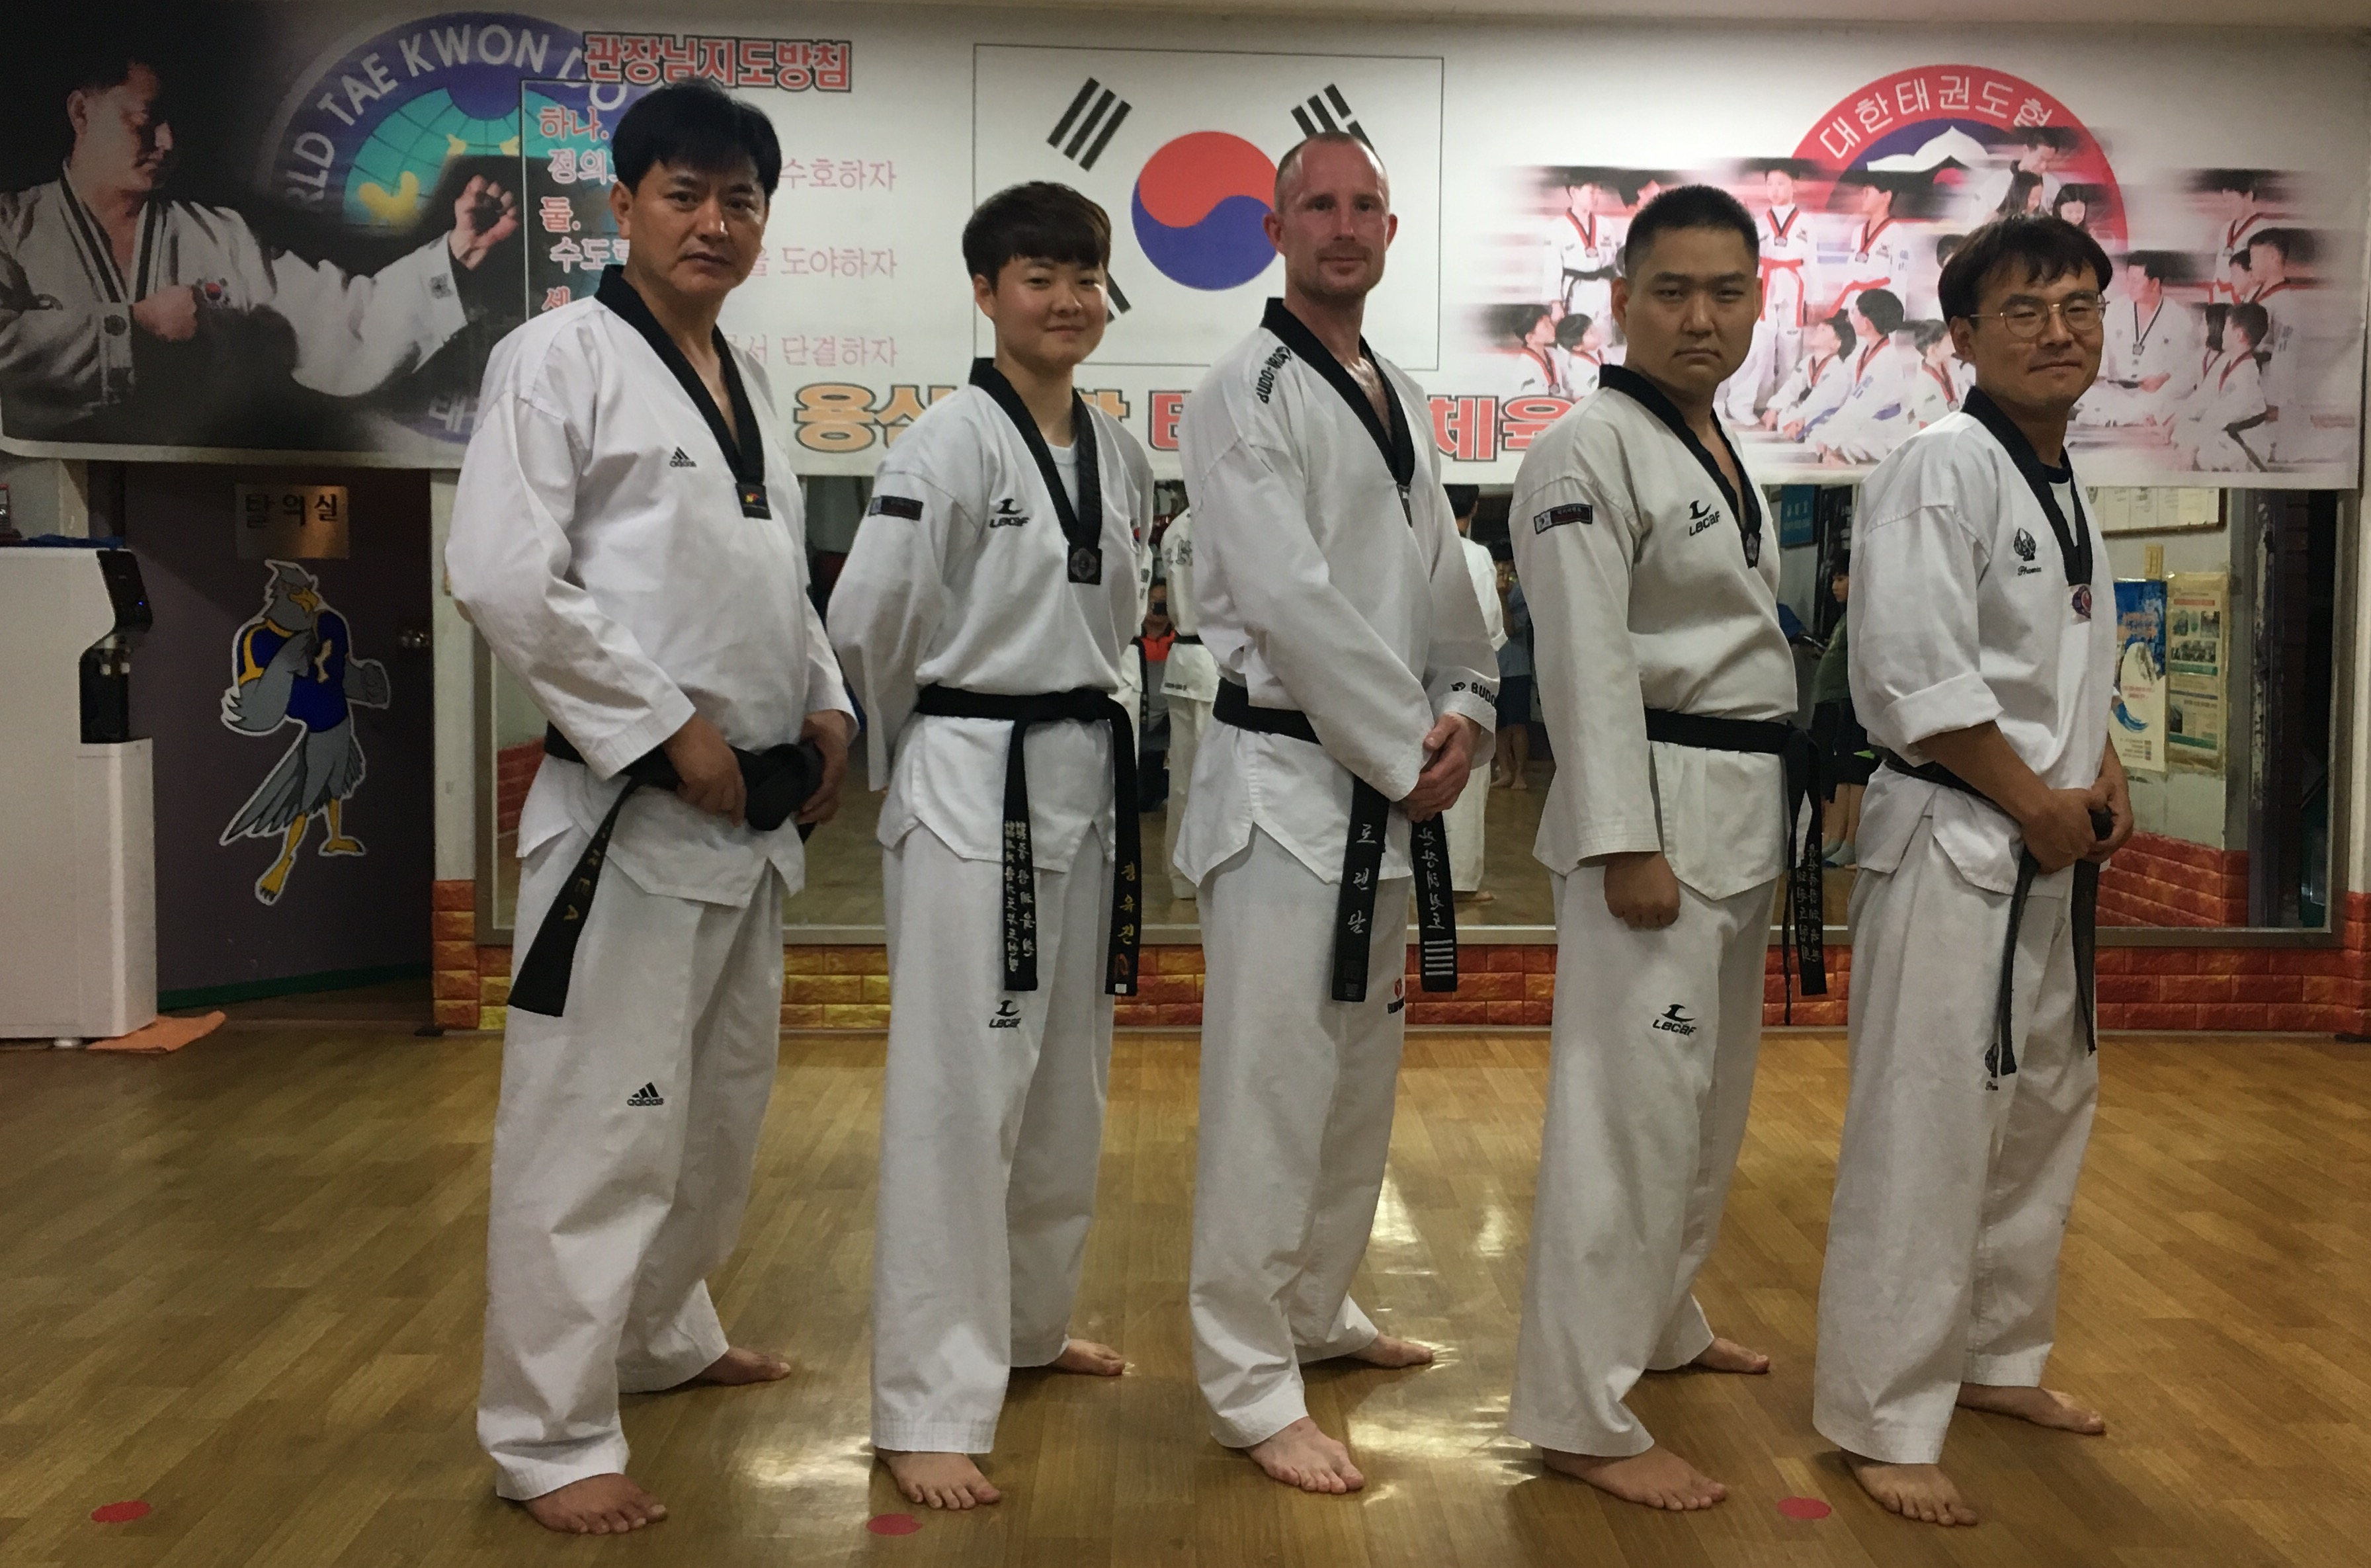 På Besøg Hos Yongsan Sports Academy